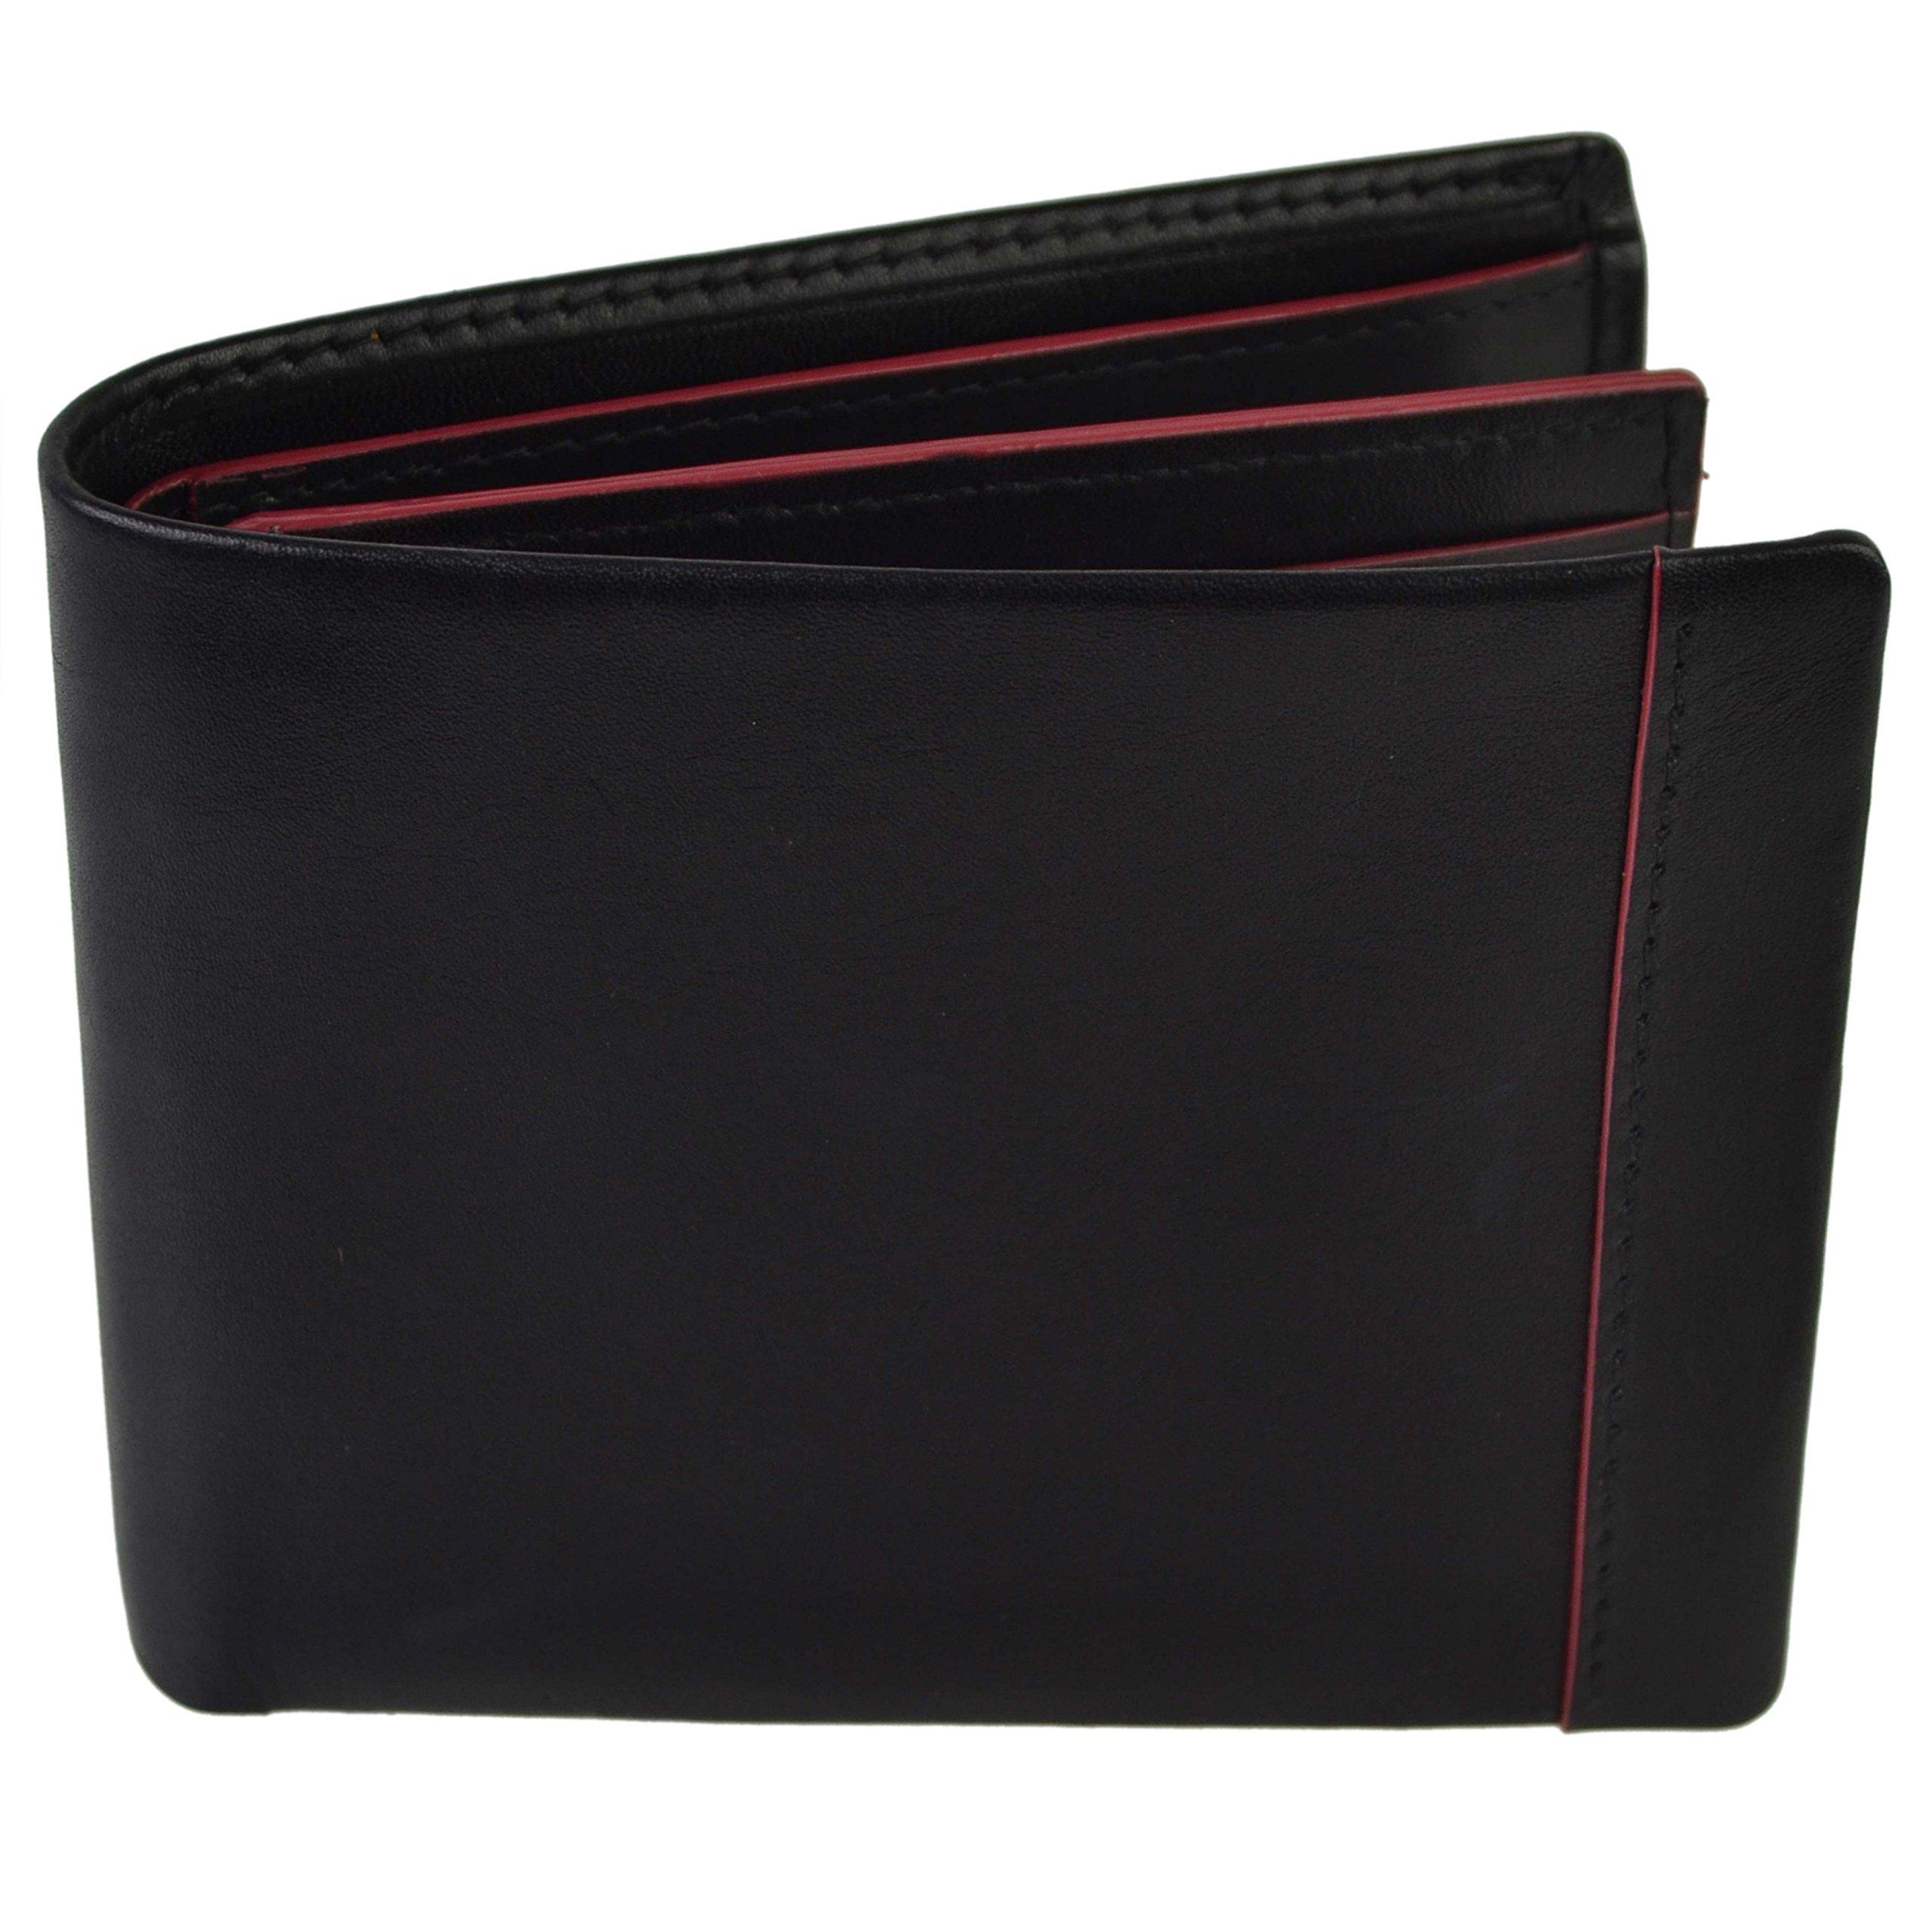 Golunski Real Leather Bi-Fold Wallet By Gift Boxed Coloured Hightlights